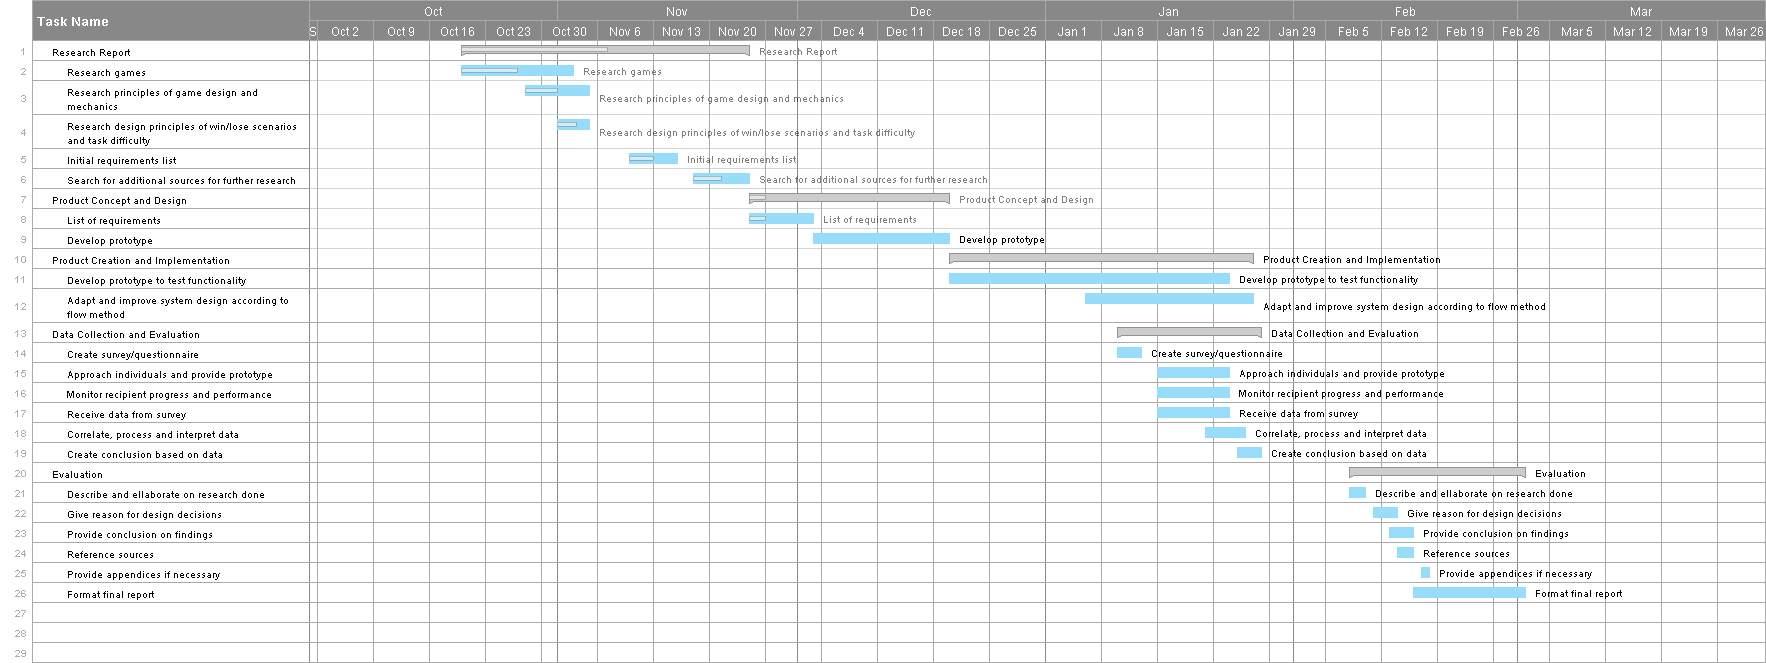 C:UsersArminAppDataLocalMicrosoftWindowsINetCacheContent.WordBasic Project with Gantt Chart.png